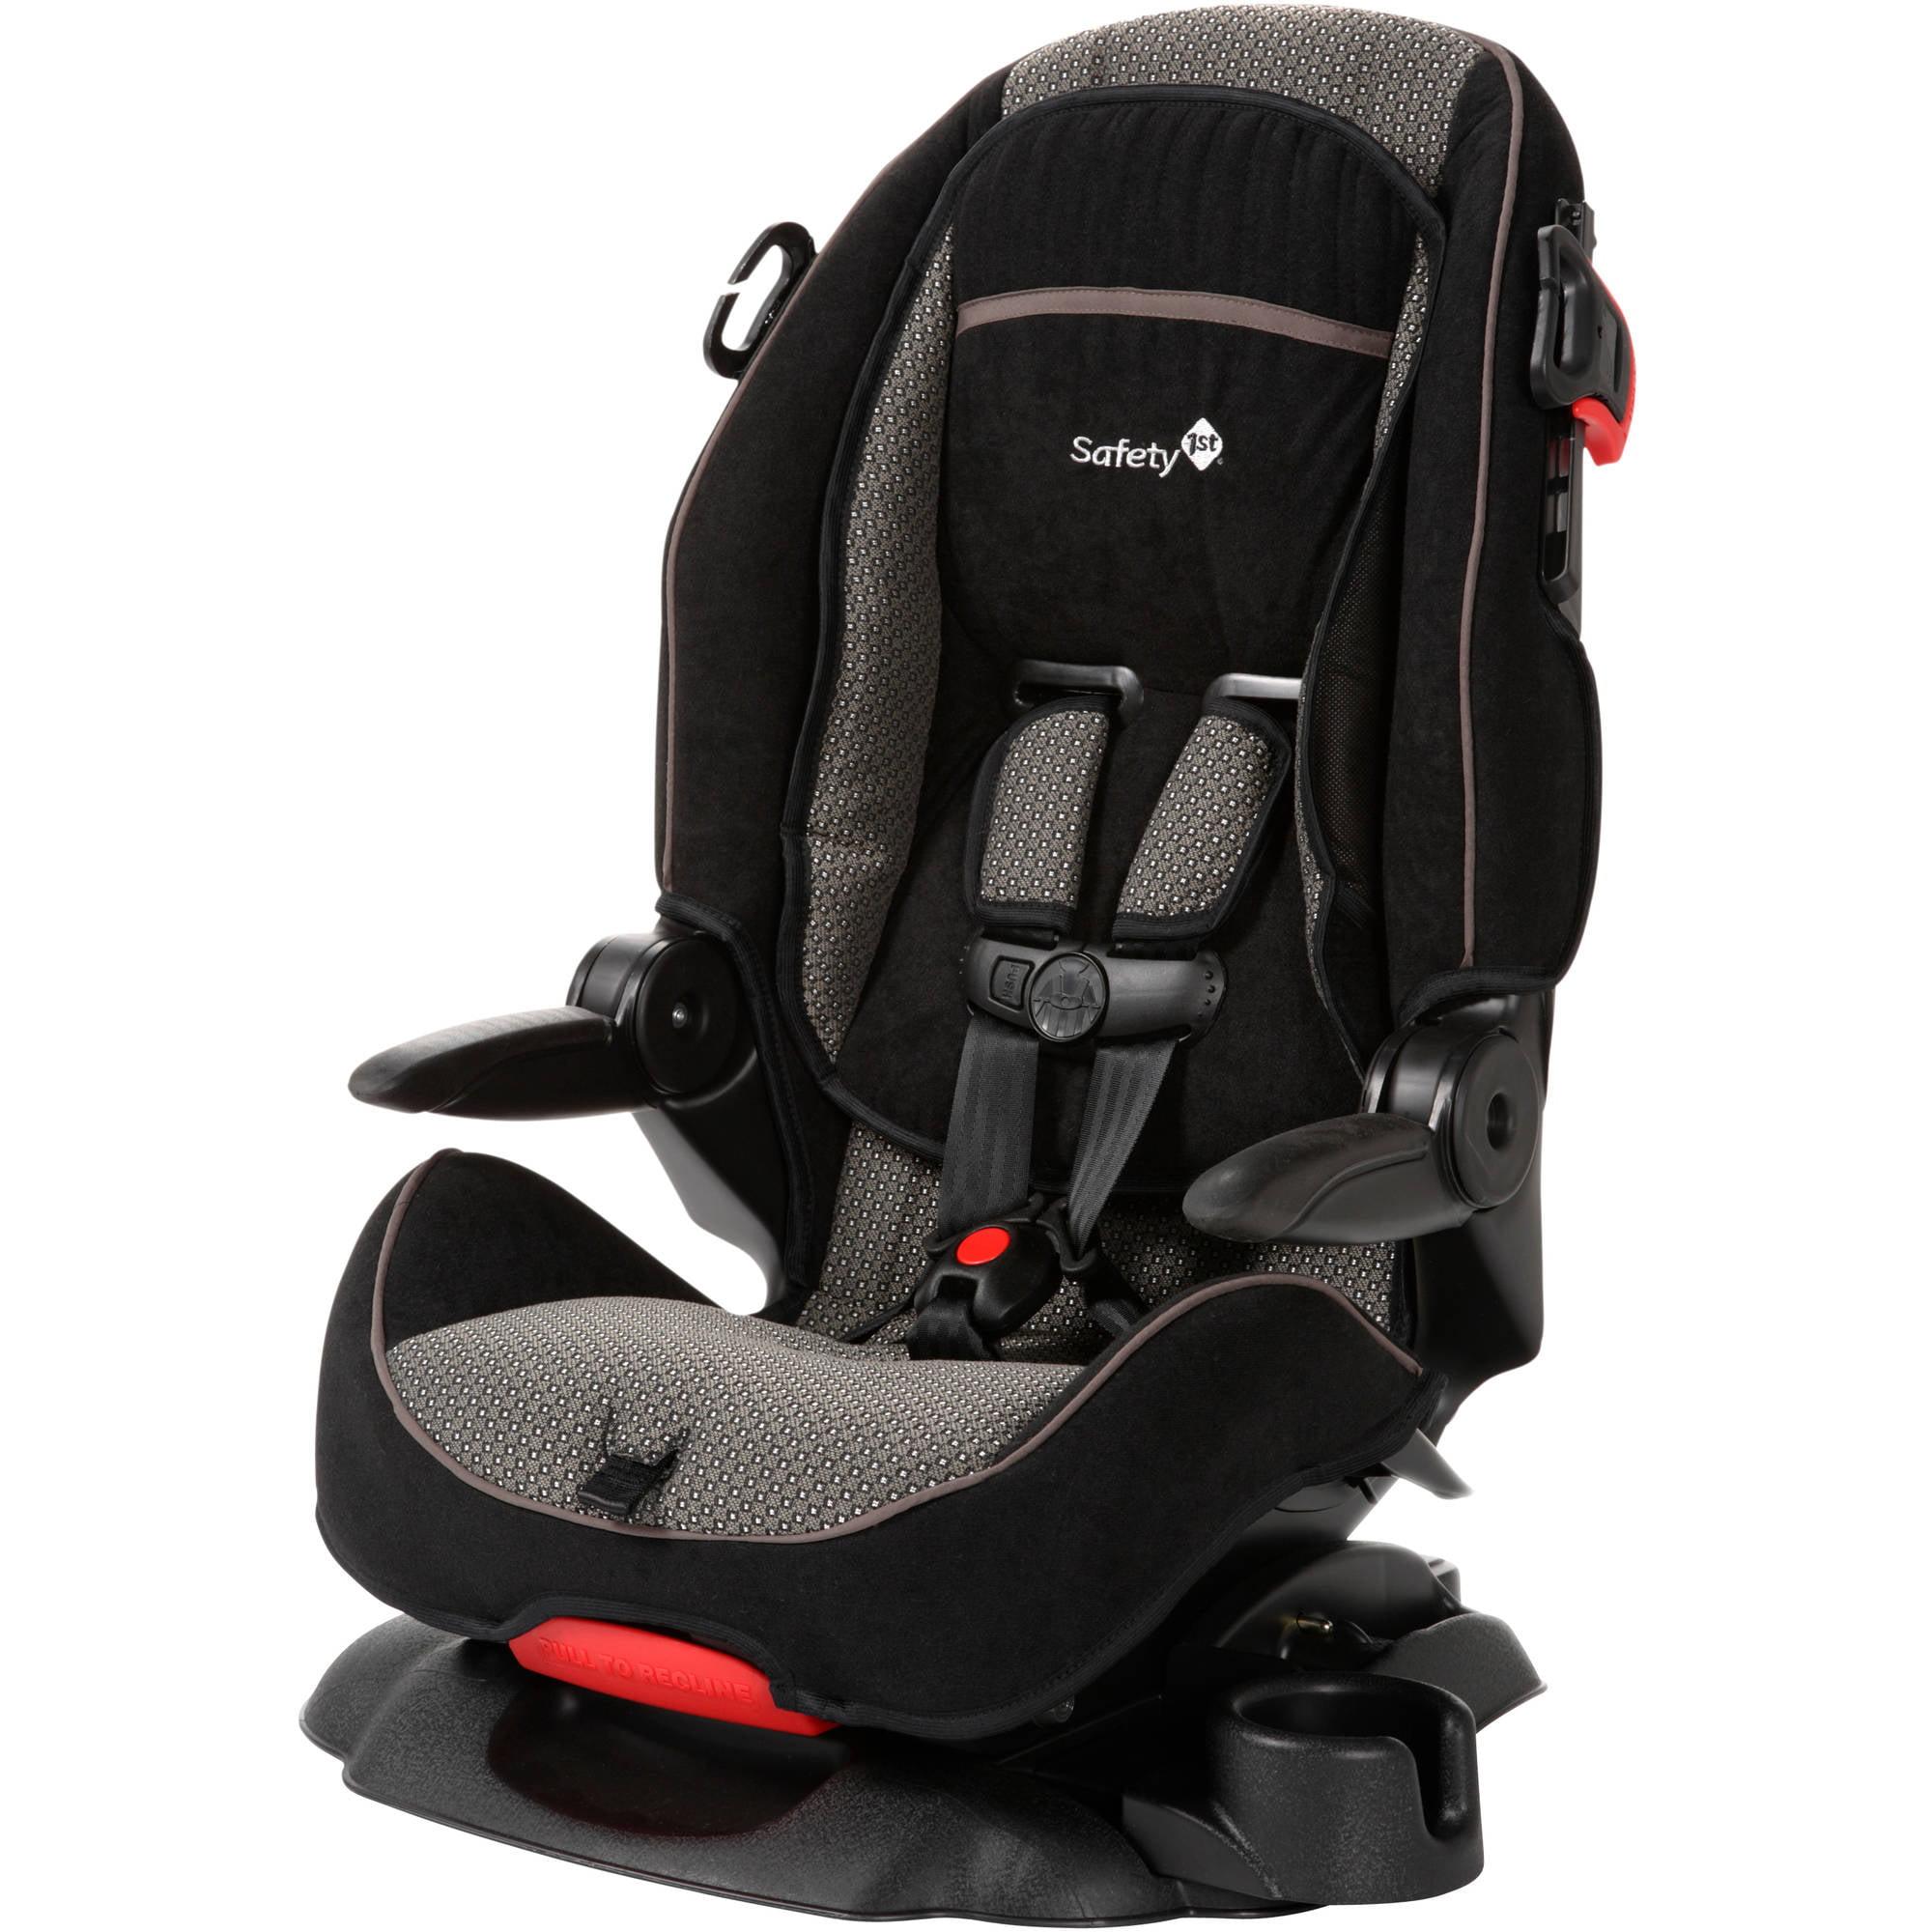 Safety 1st- Summit Booster Car Seat, Yuk